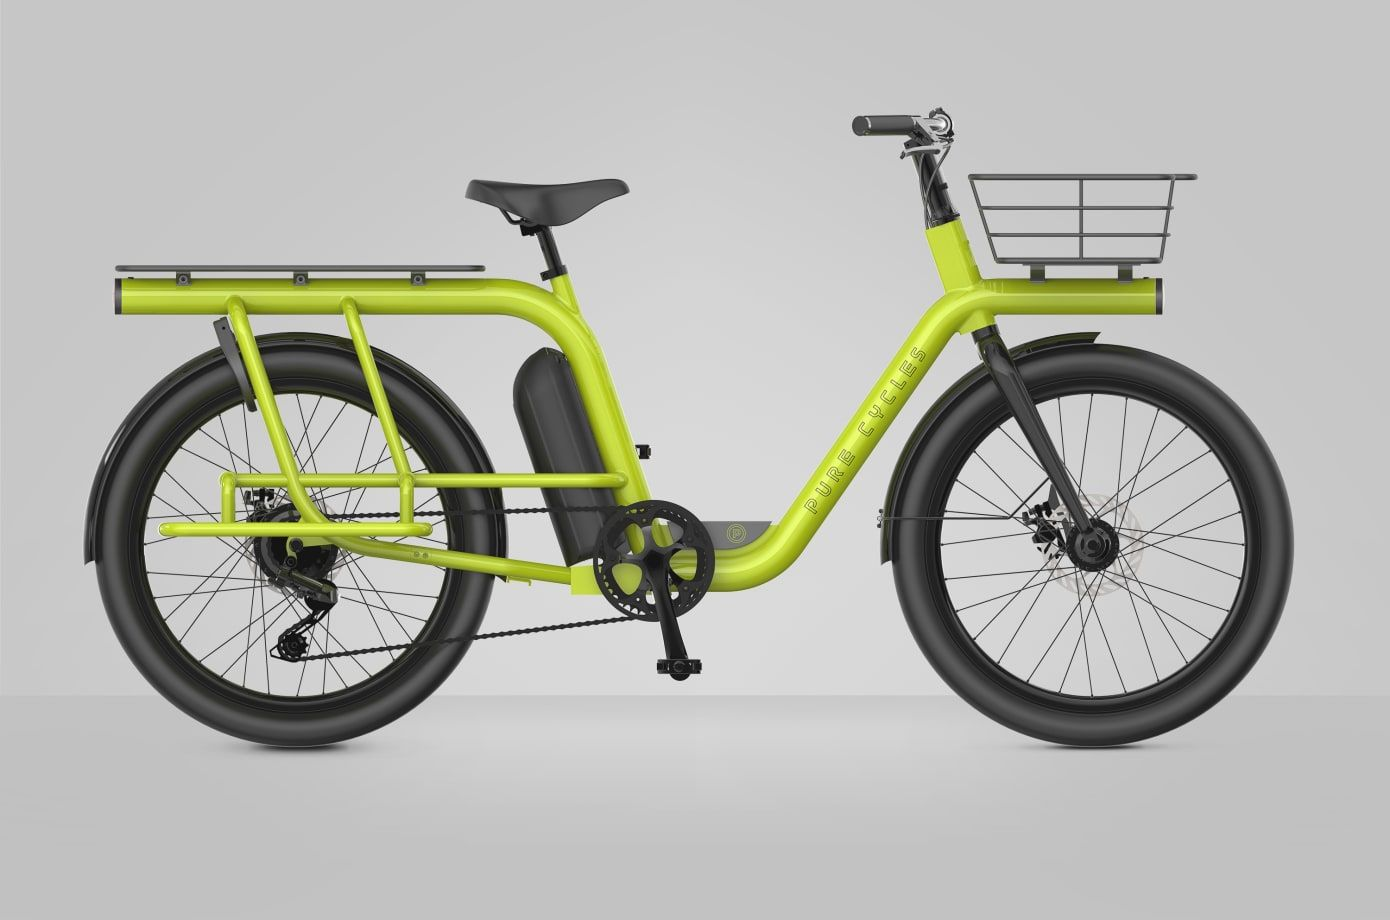 Capacita The Most Affordable Smart Cargo E Bike